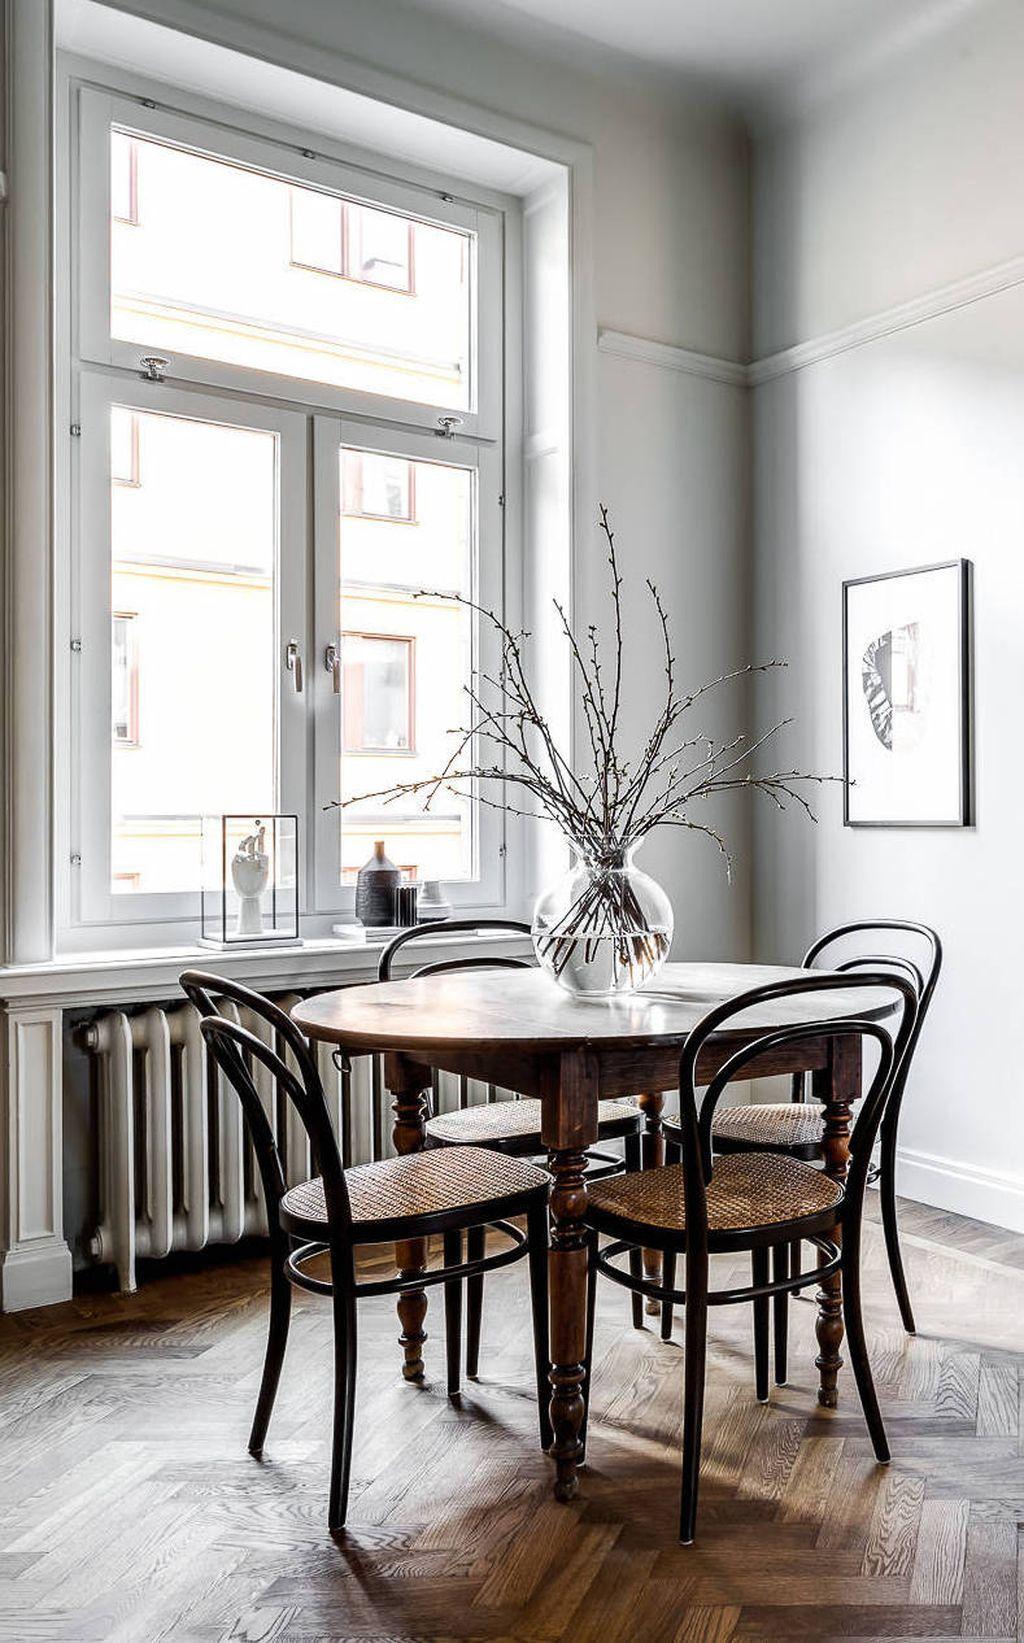 50 Simple Scandinavian Dining Room Ideas